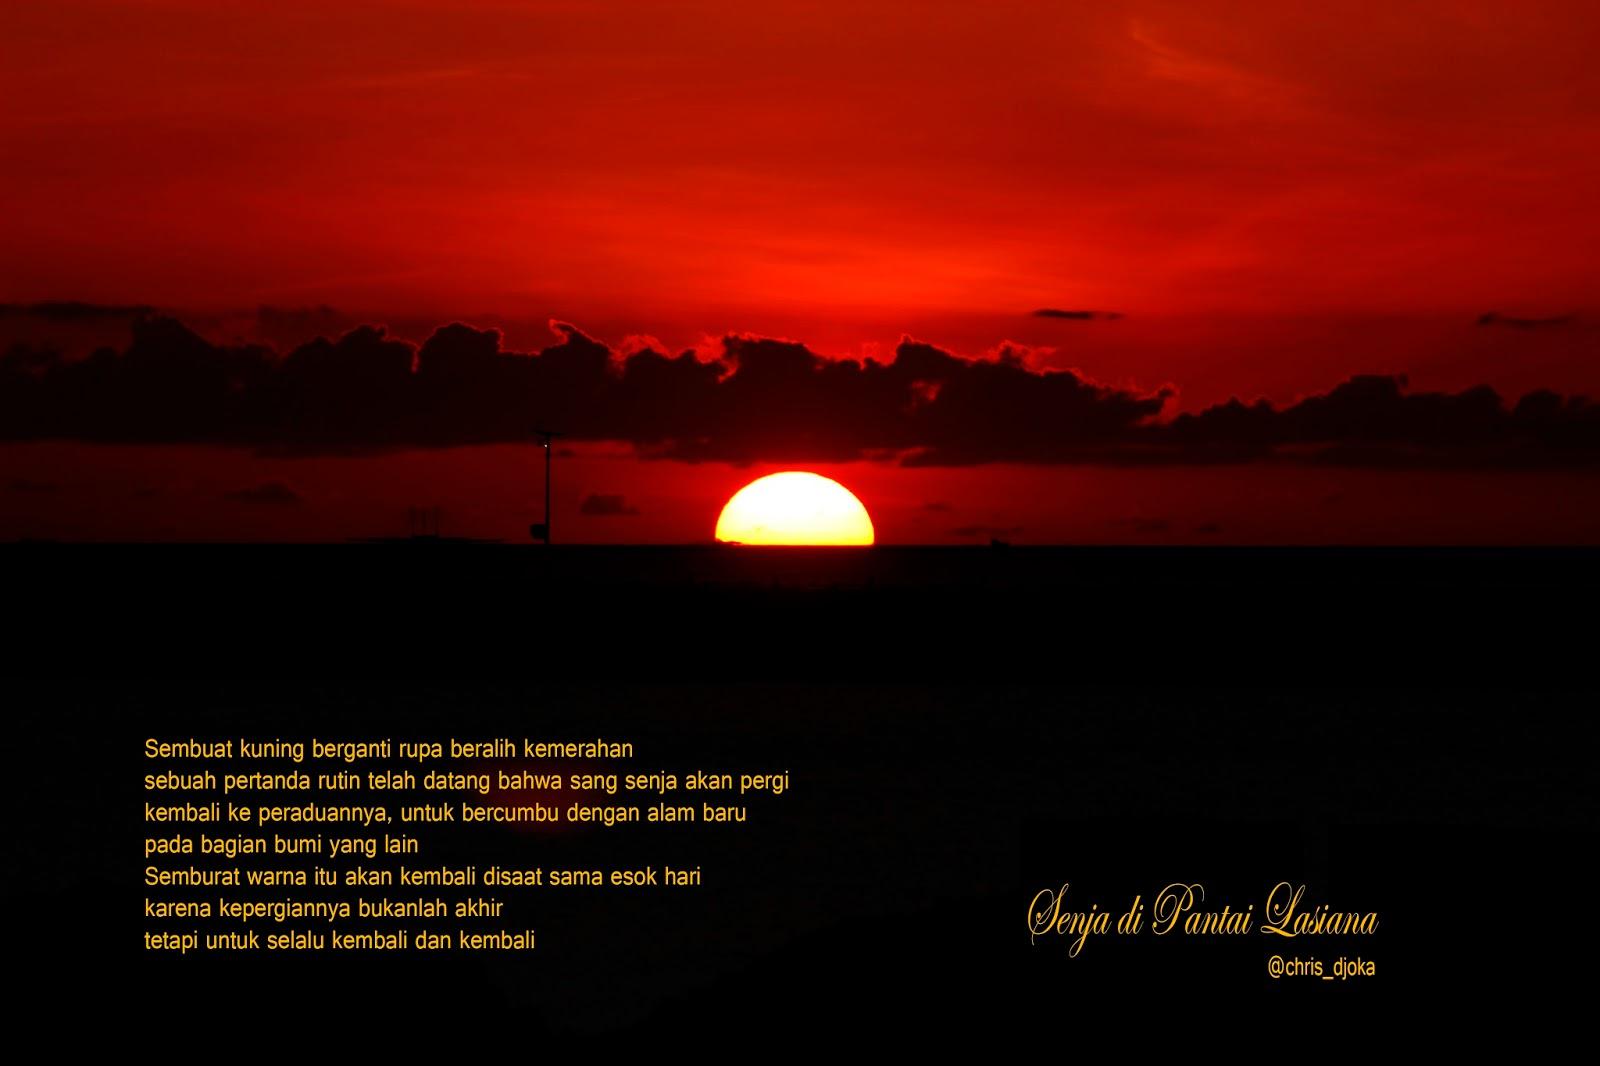 Sunset Kupang Flores Borneo Mengunjungi Objek Wisata Religi Oebelo Taman